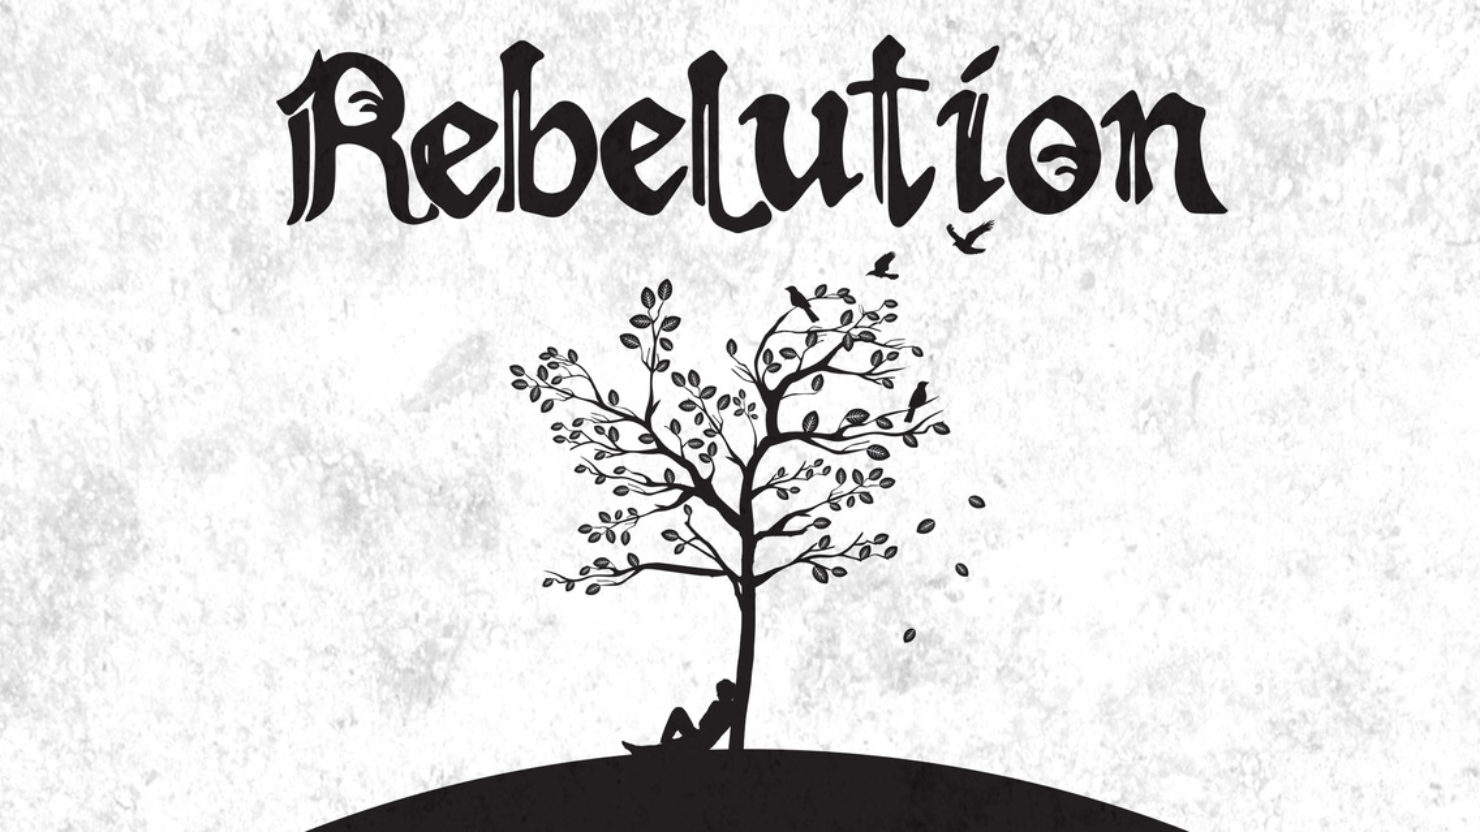 Rebelution on my mind